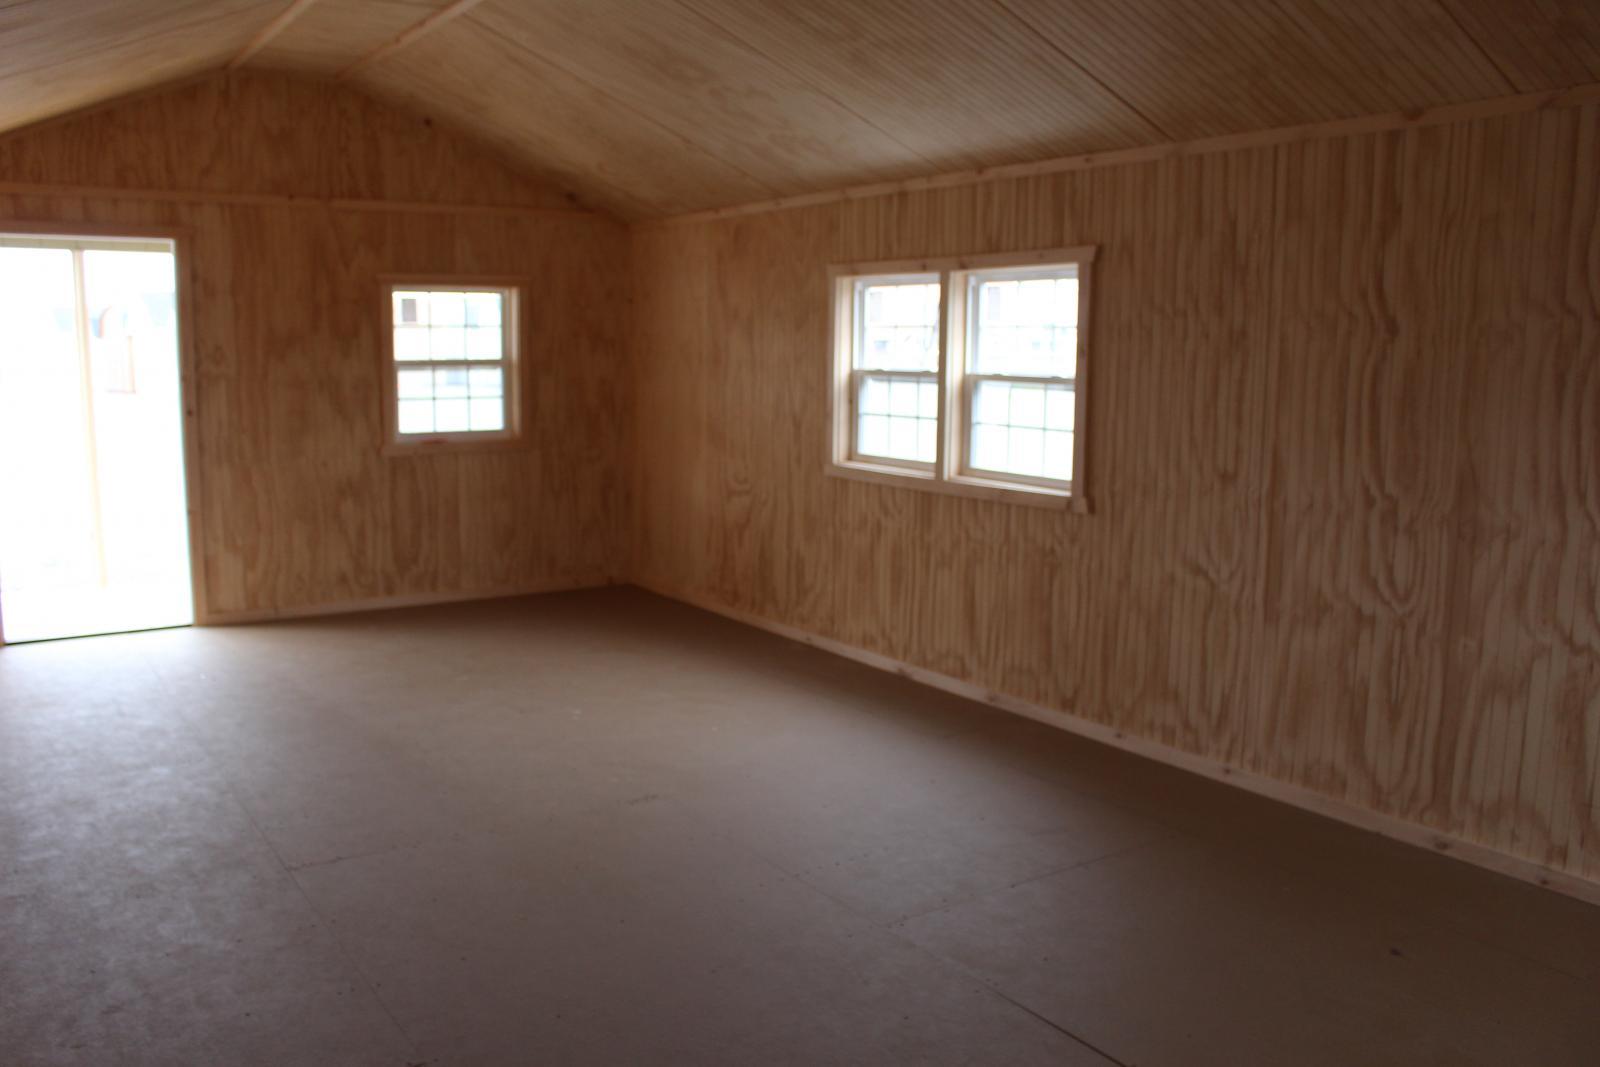 Pine Creek 14x32 Peak White Deer Cabin Shed Sheds Barn